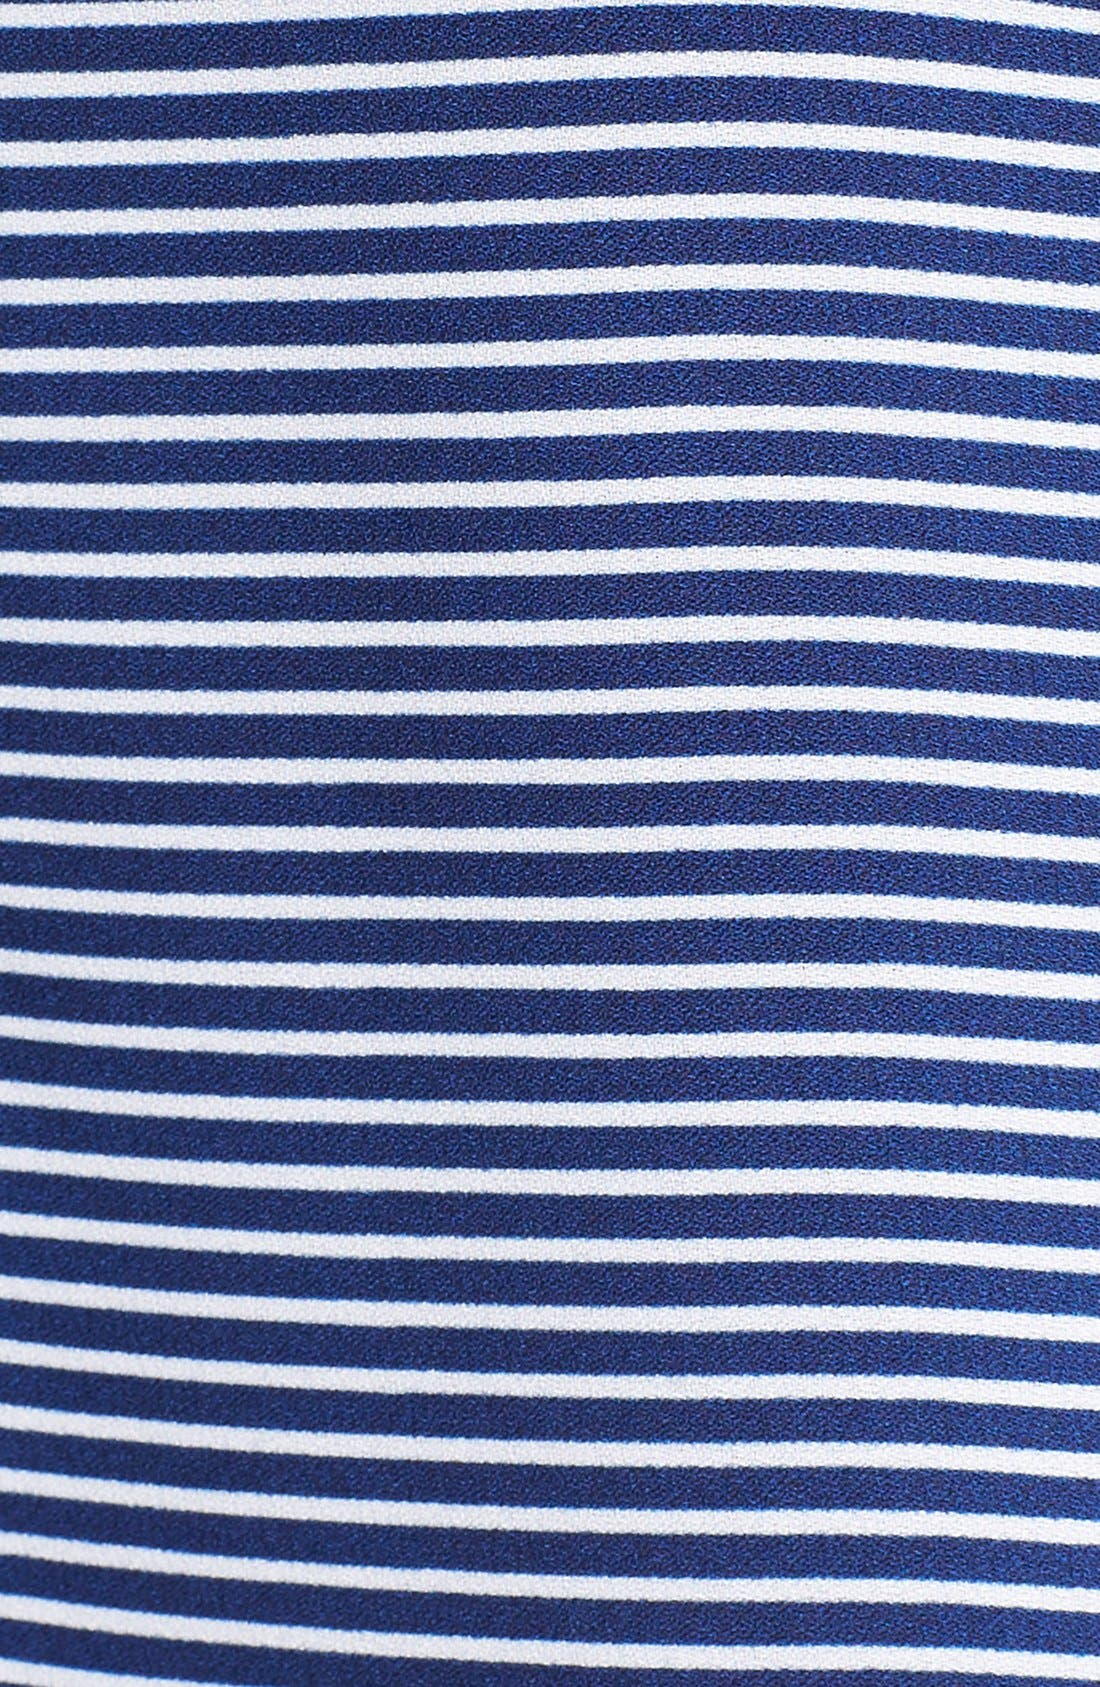 Stripe Woven Camisole,                             Alternate thumbnail 5, color,                             Navy Evening Callington Stripe